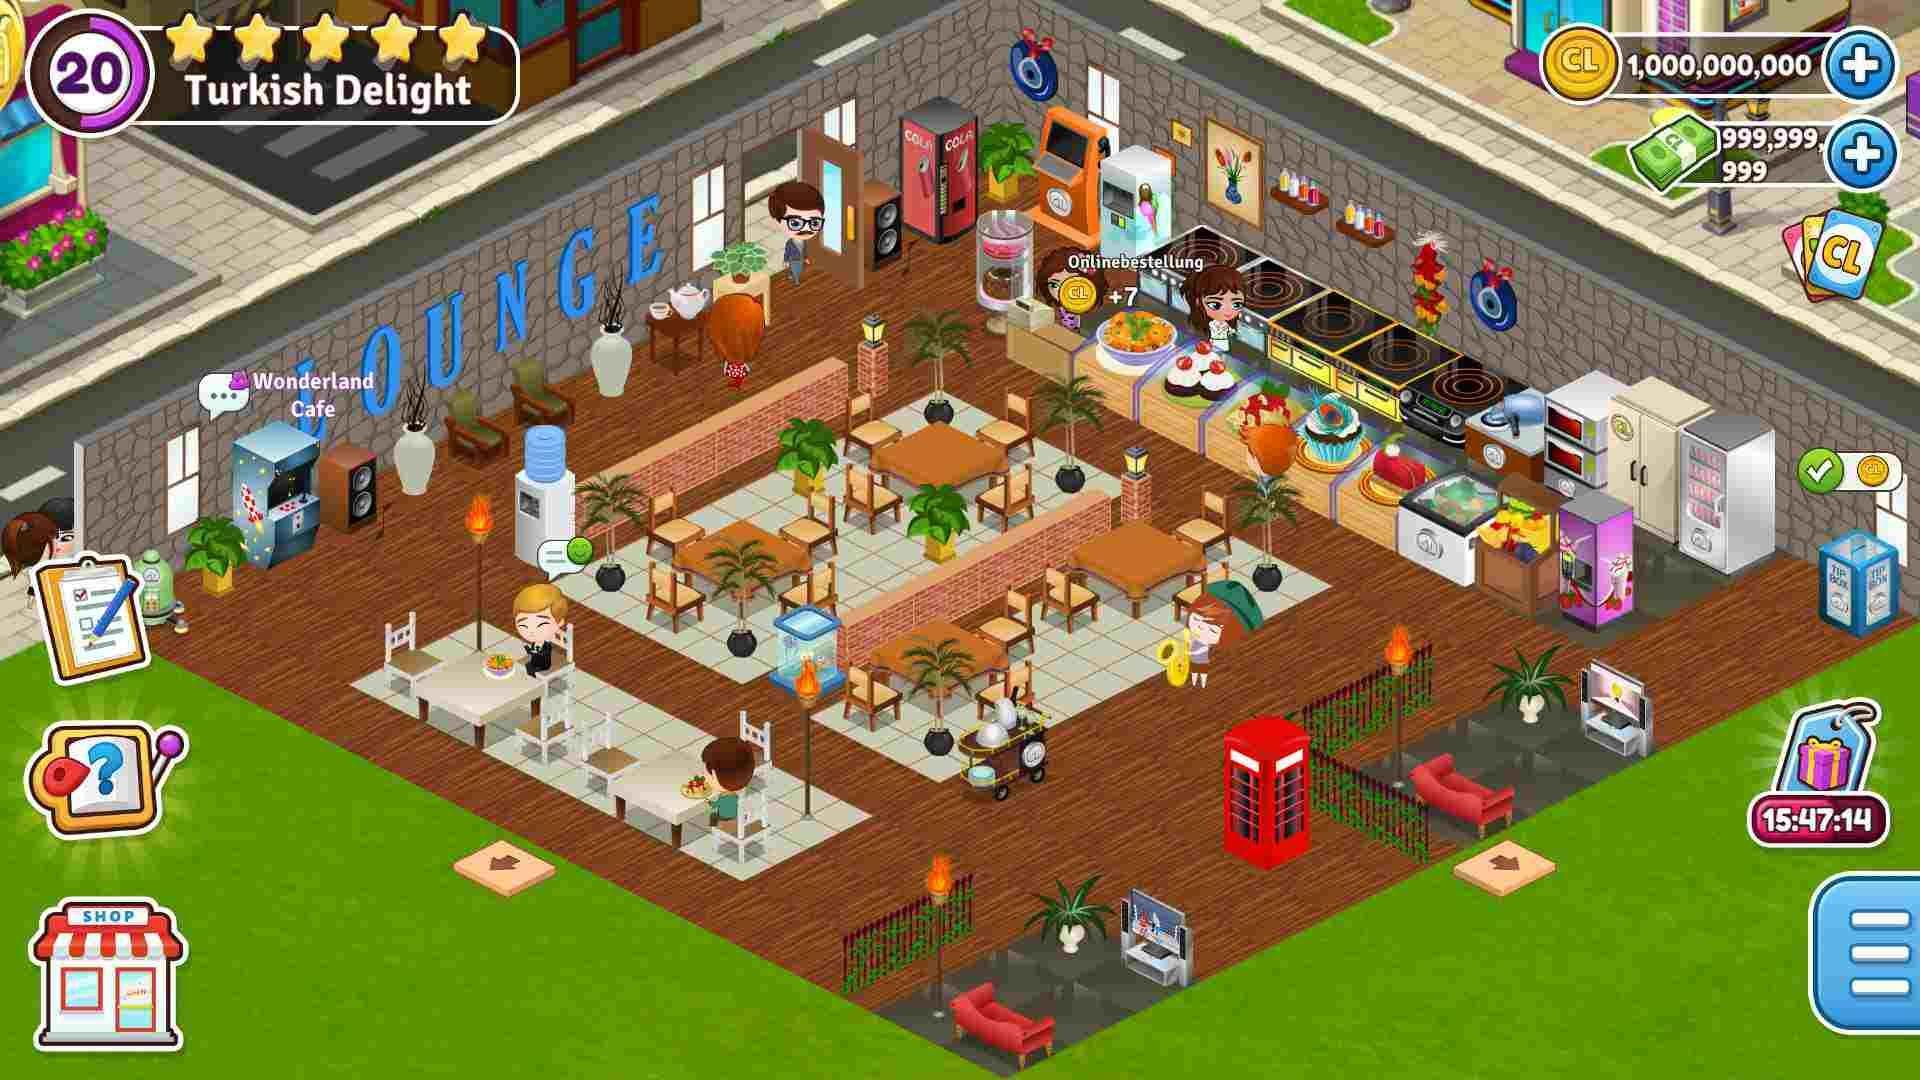 Cafeland world kitchen mod apk unlimited money v2123